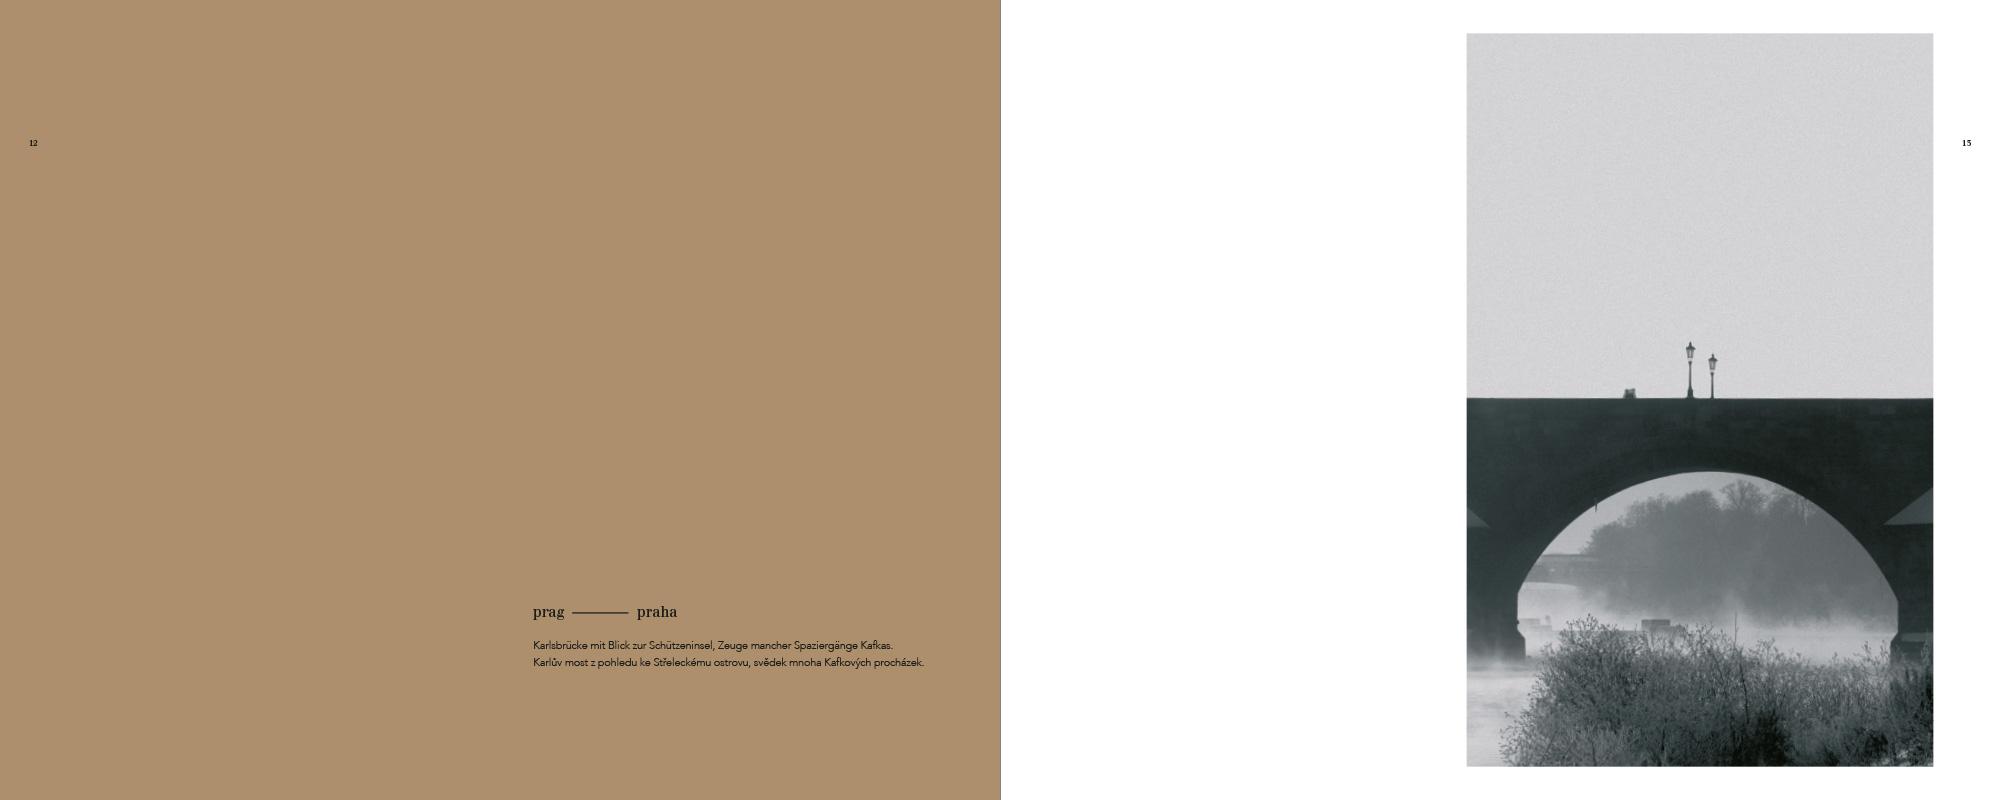 [album/Products_Model_Product/69/Kafka_Cesty_2-16.jpg]